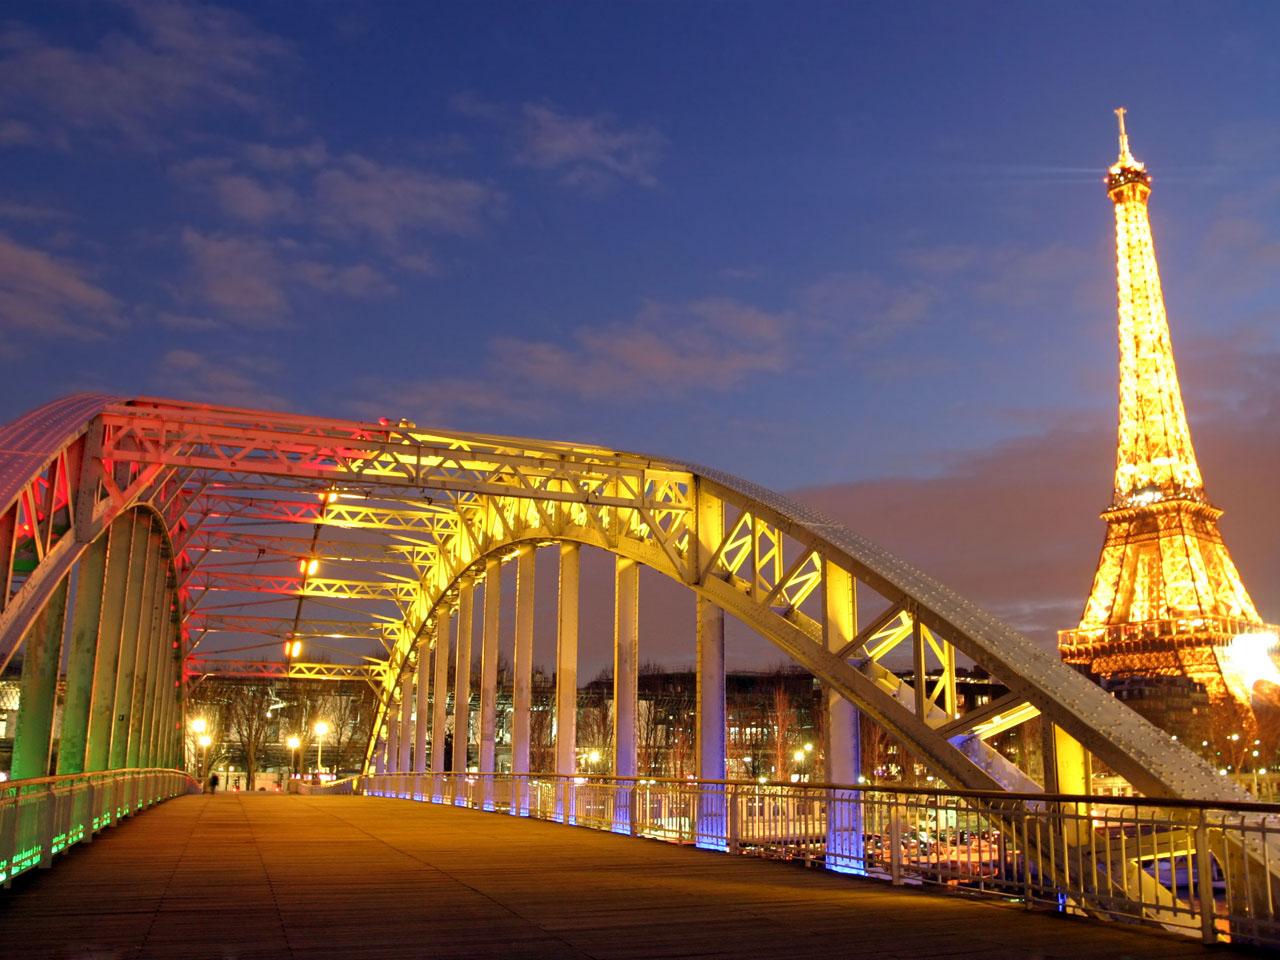 Фото Парижа столицы любви — TourBlogger.ru: www.tourblogger.ru/articles/foto-parizha-stolitsy-lyubvi.html